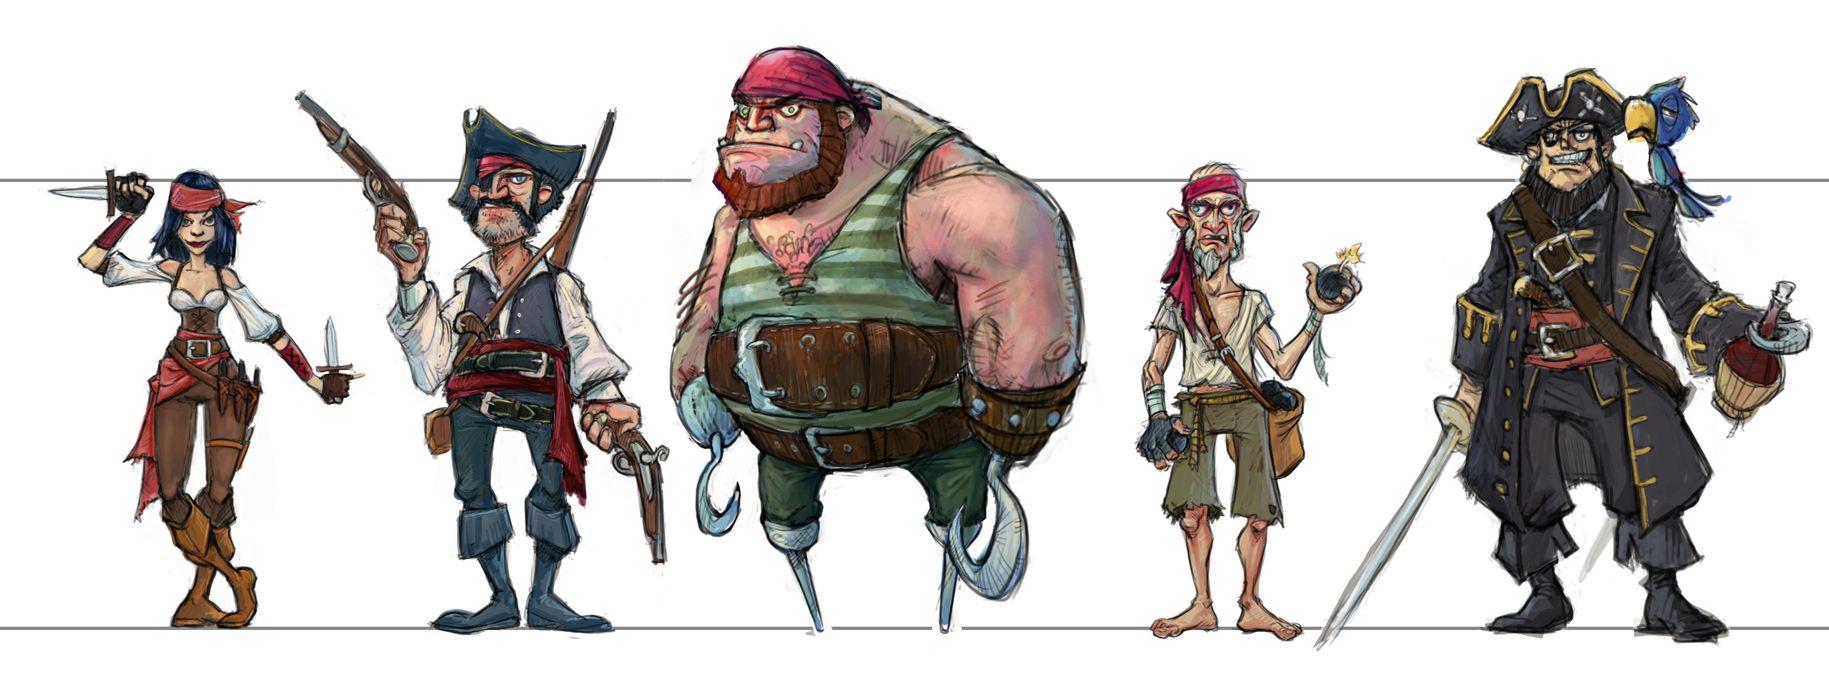 Monkey island 2 lechuck s revenge concept art the international - Monkey Island Cerca Con Google